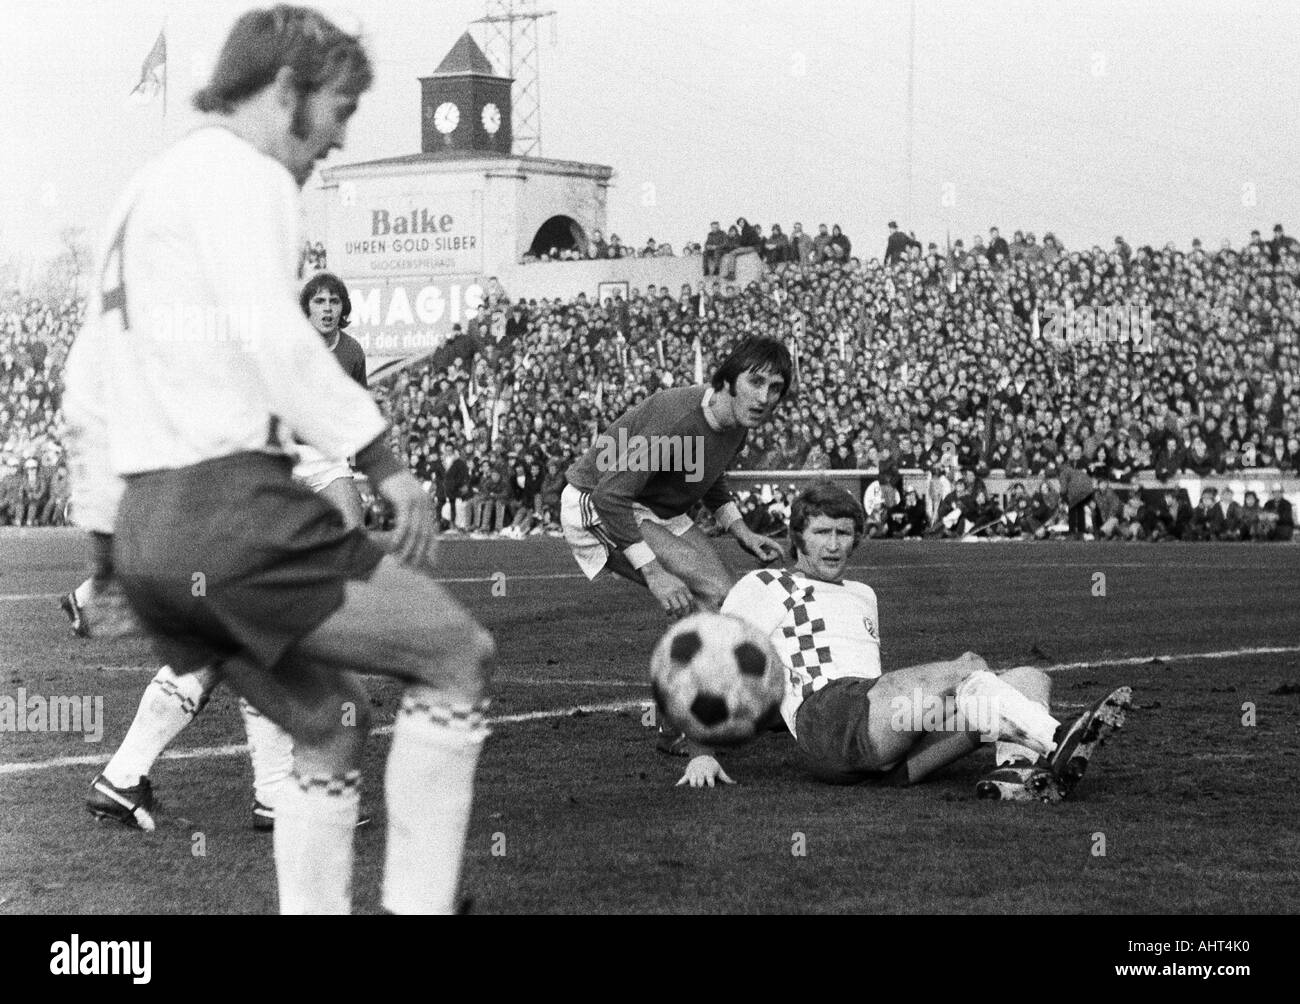 football, Bundesliga, 1970/1971, Niederrhein Stadium, Rot-Weiss Oberhausen versus Rot-Weiss Essen 0:0, scene of the match, f.l.t.r. Wolfgang Rausch (RWE), Hans Fritsche, Guenter Karbowiak (both RWO), Hermann Erlhoff (RWE) - Stock Image